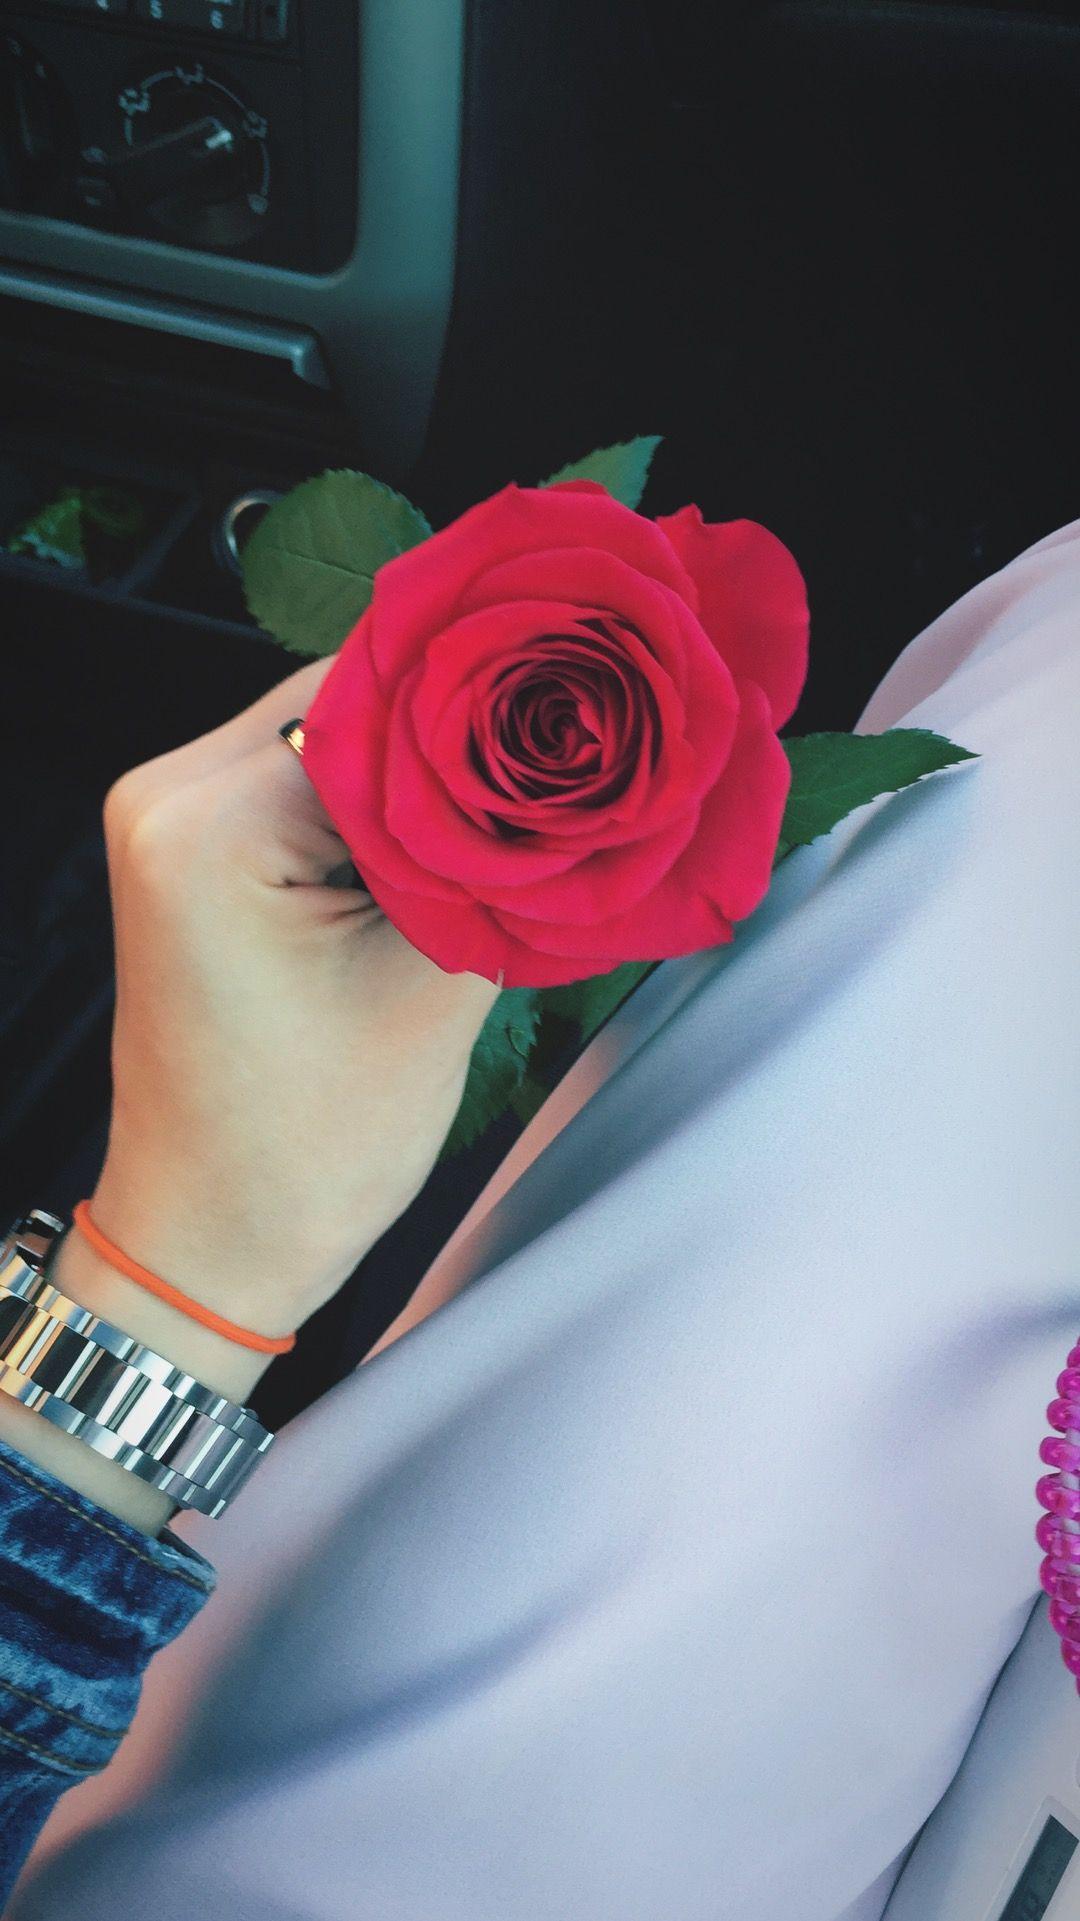 Aysun Red Rose Tumblr Rose Tumblr Red Roses